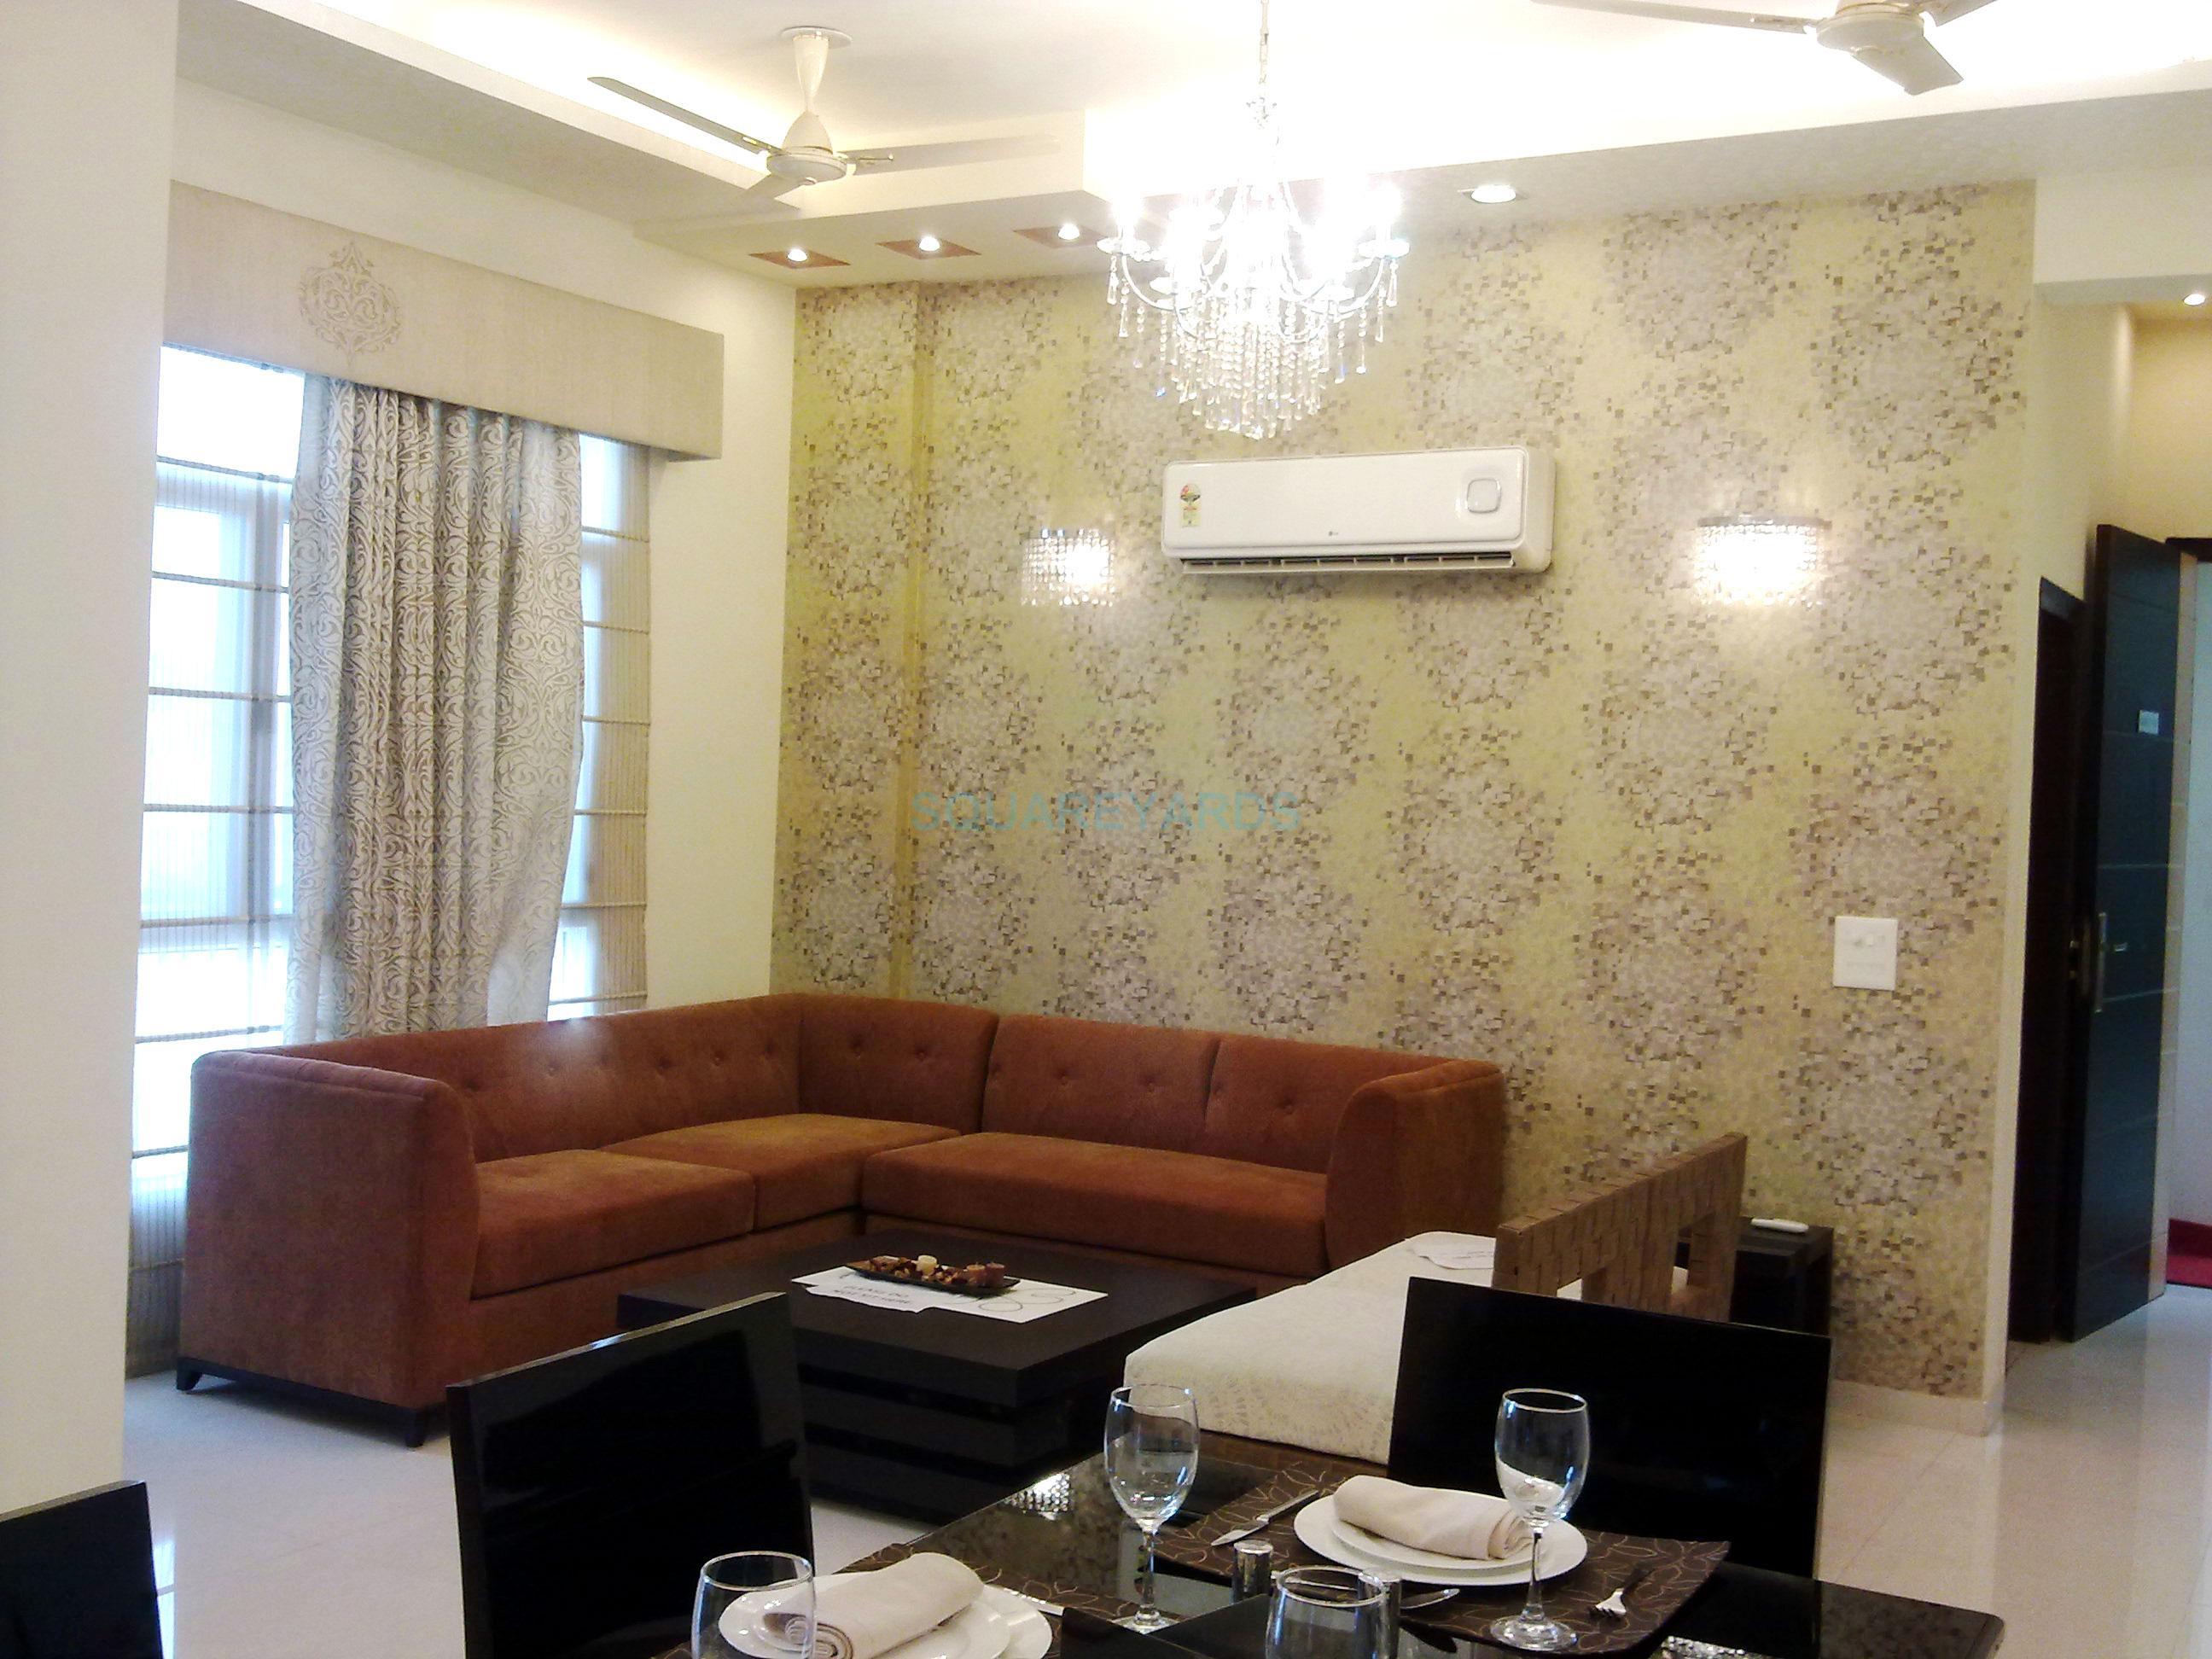 prateek wisteria apartment interiors1